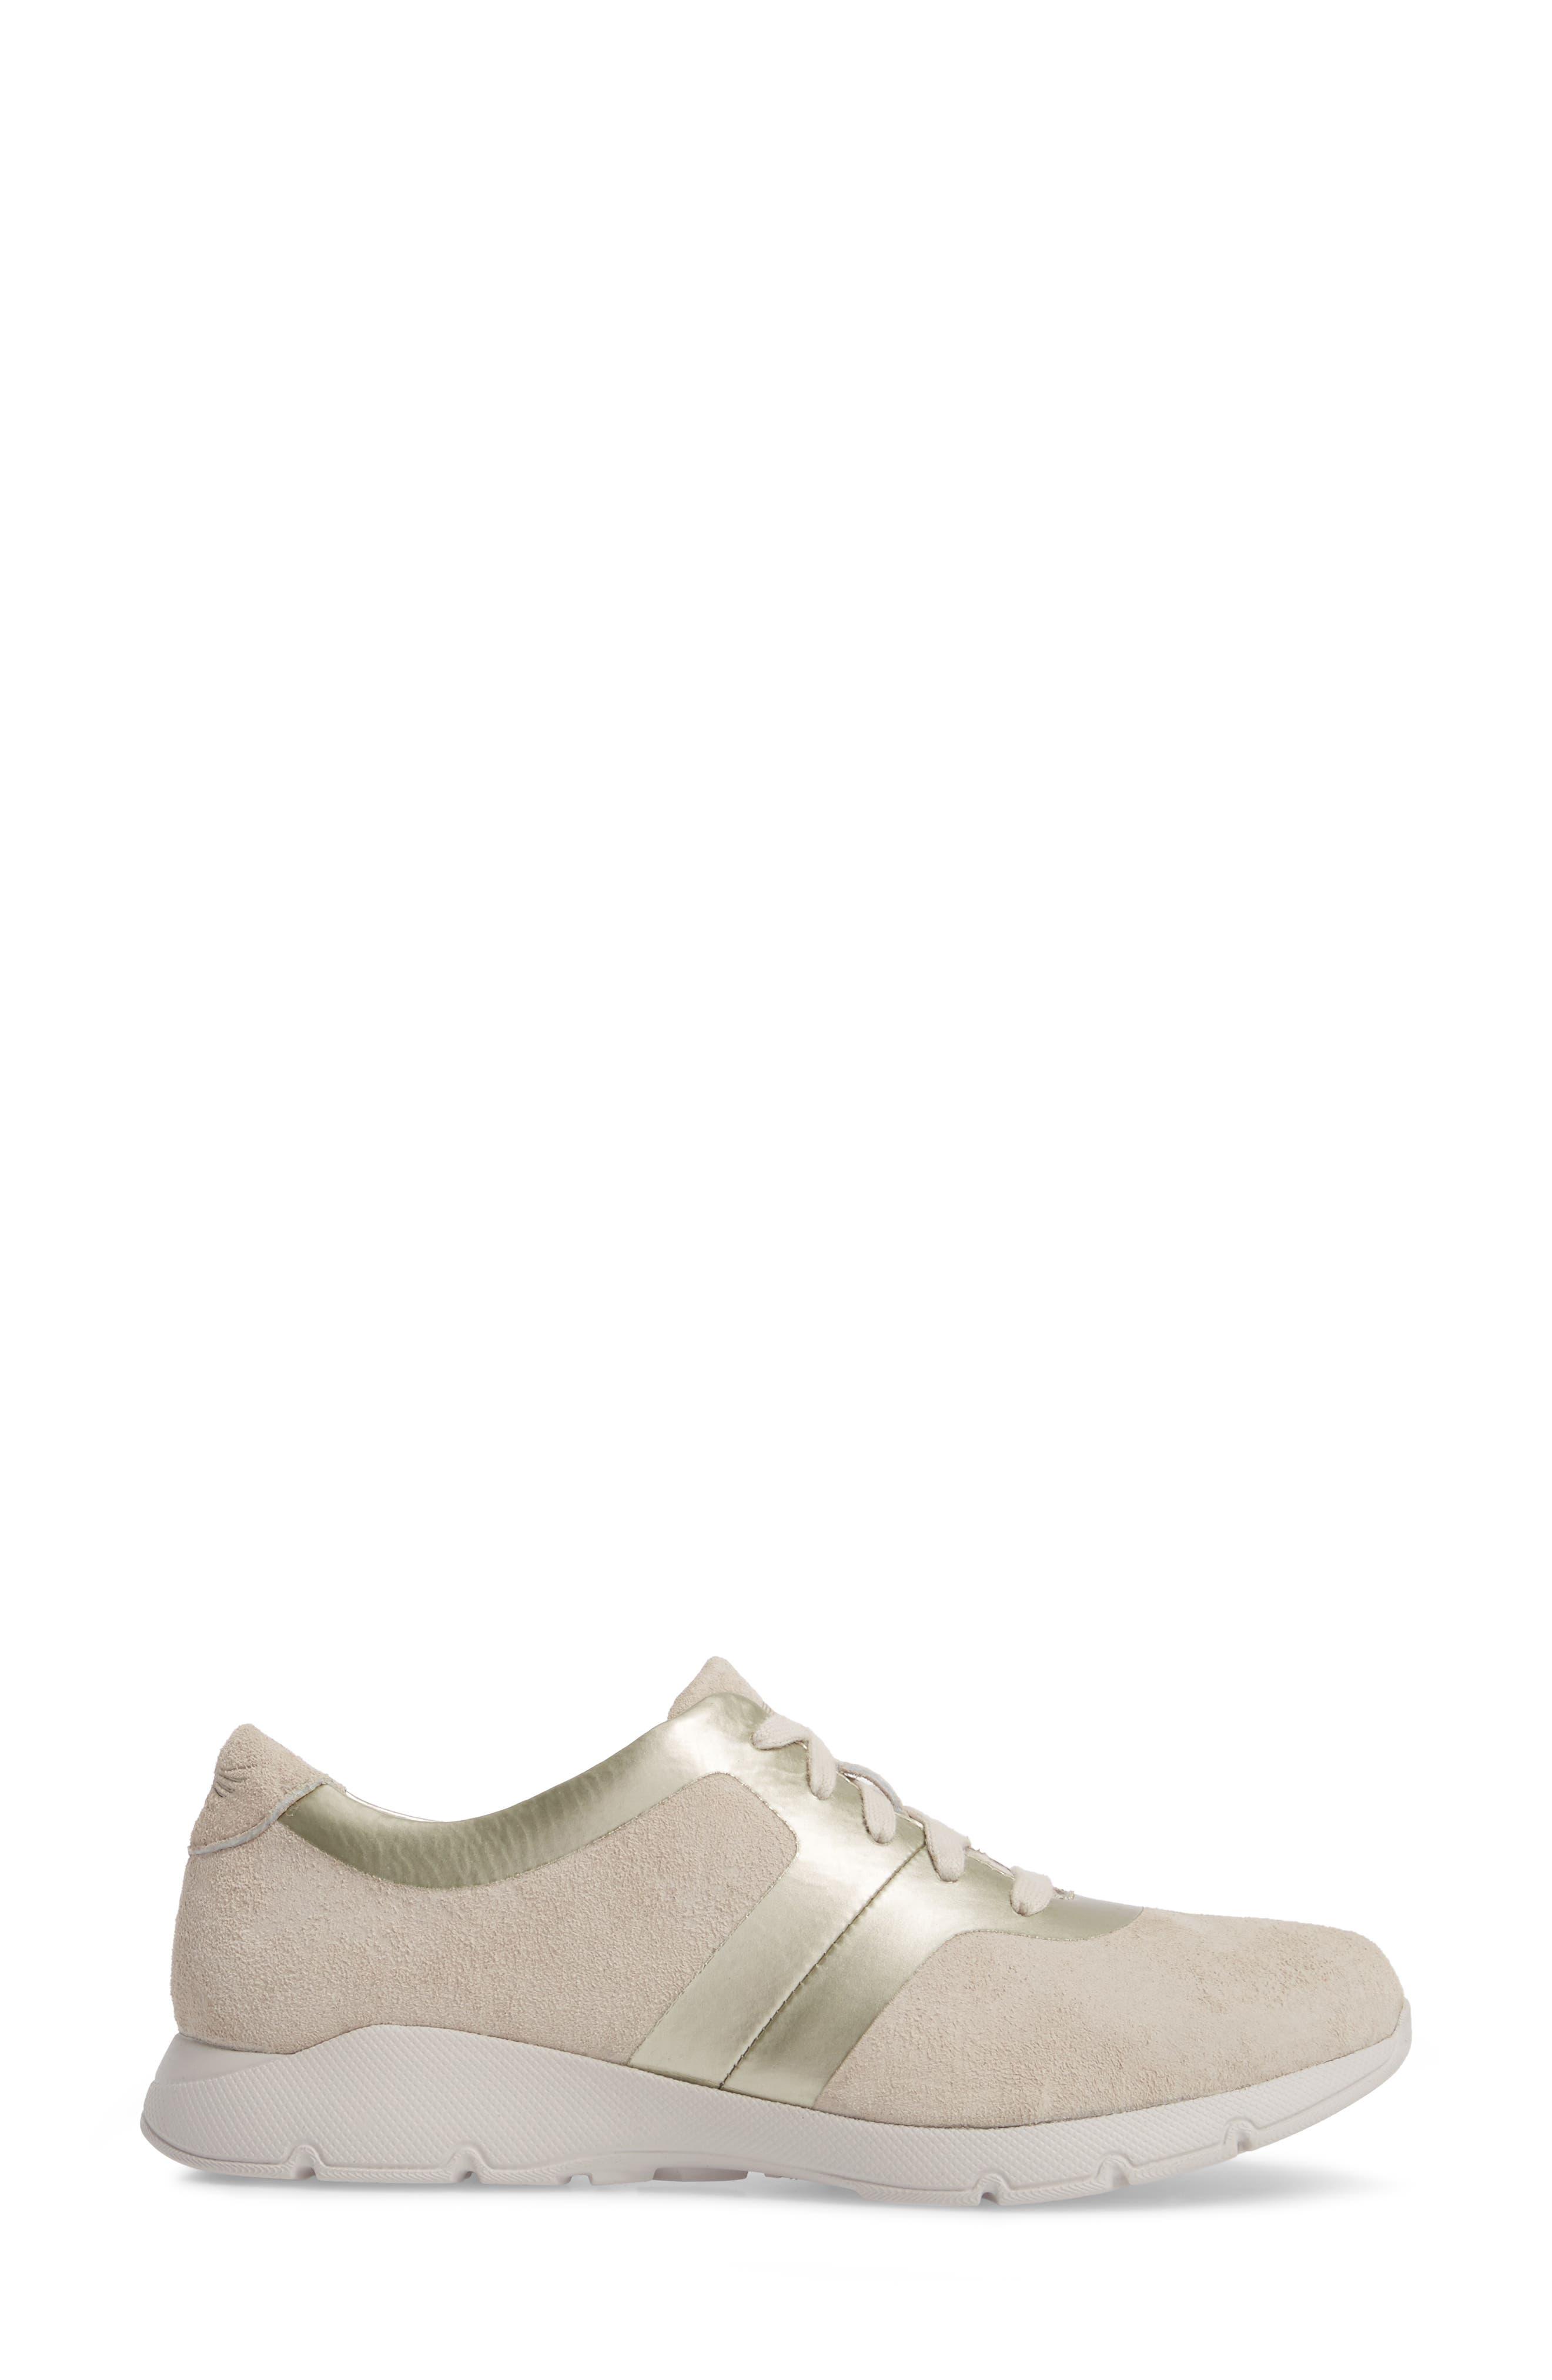 Andi Sneaker,                             Alternate thumbnail 6, color,